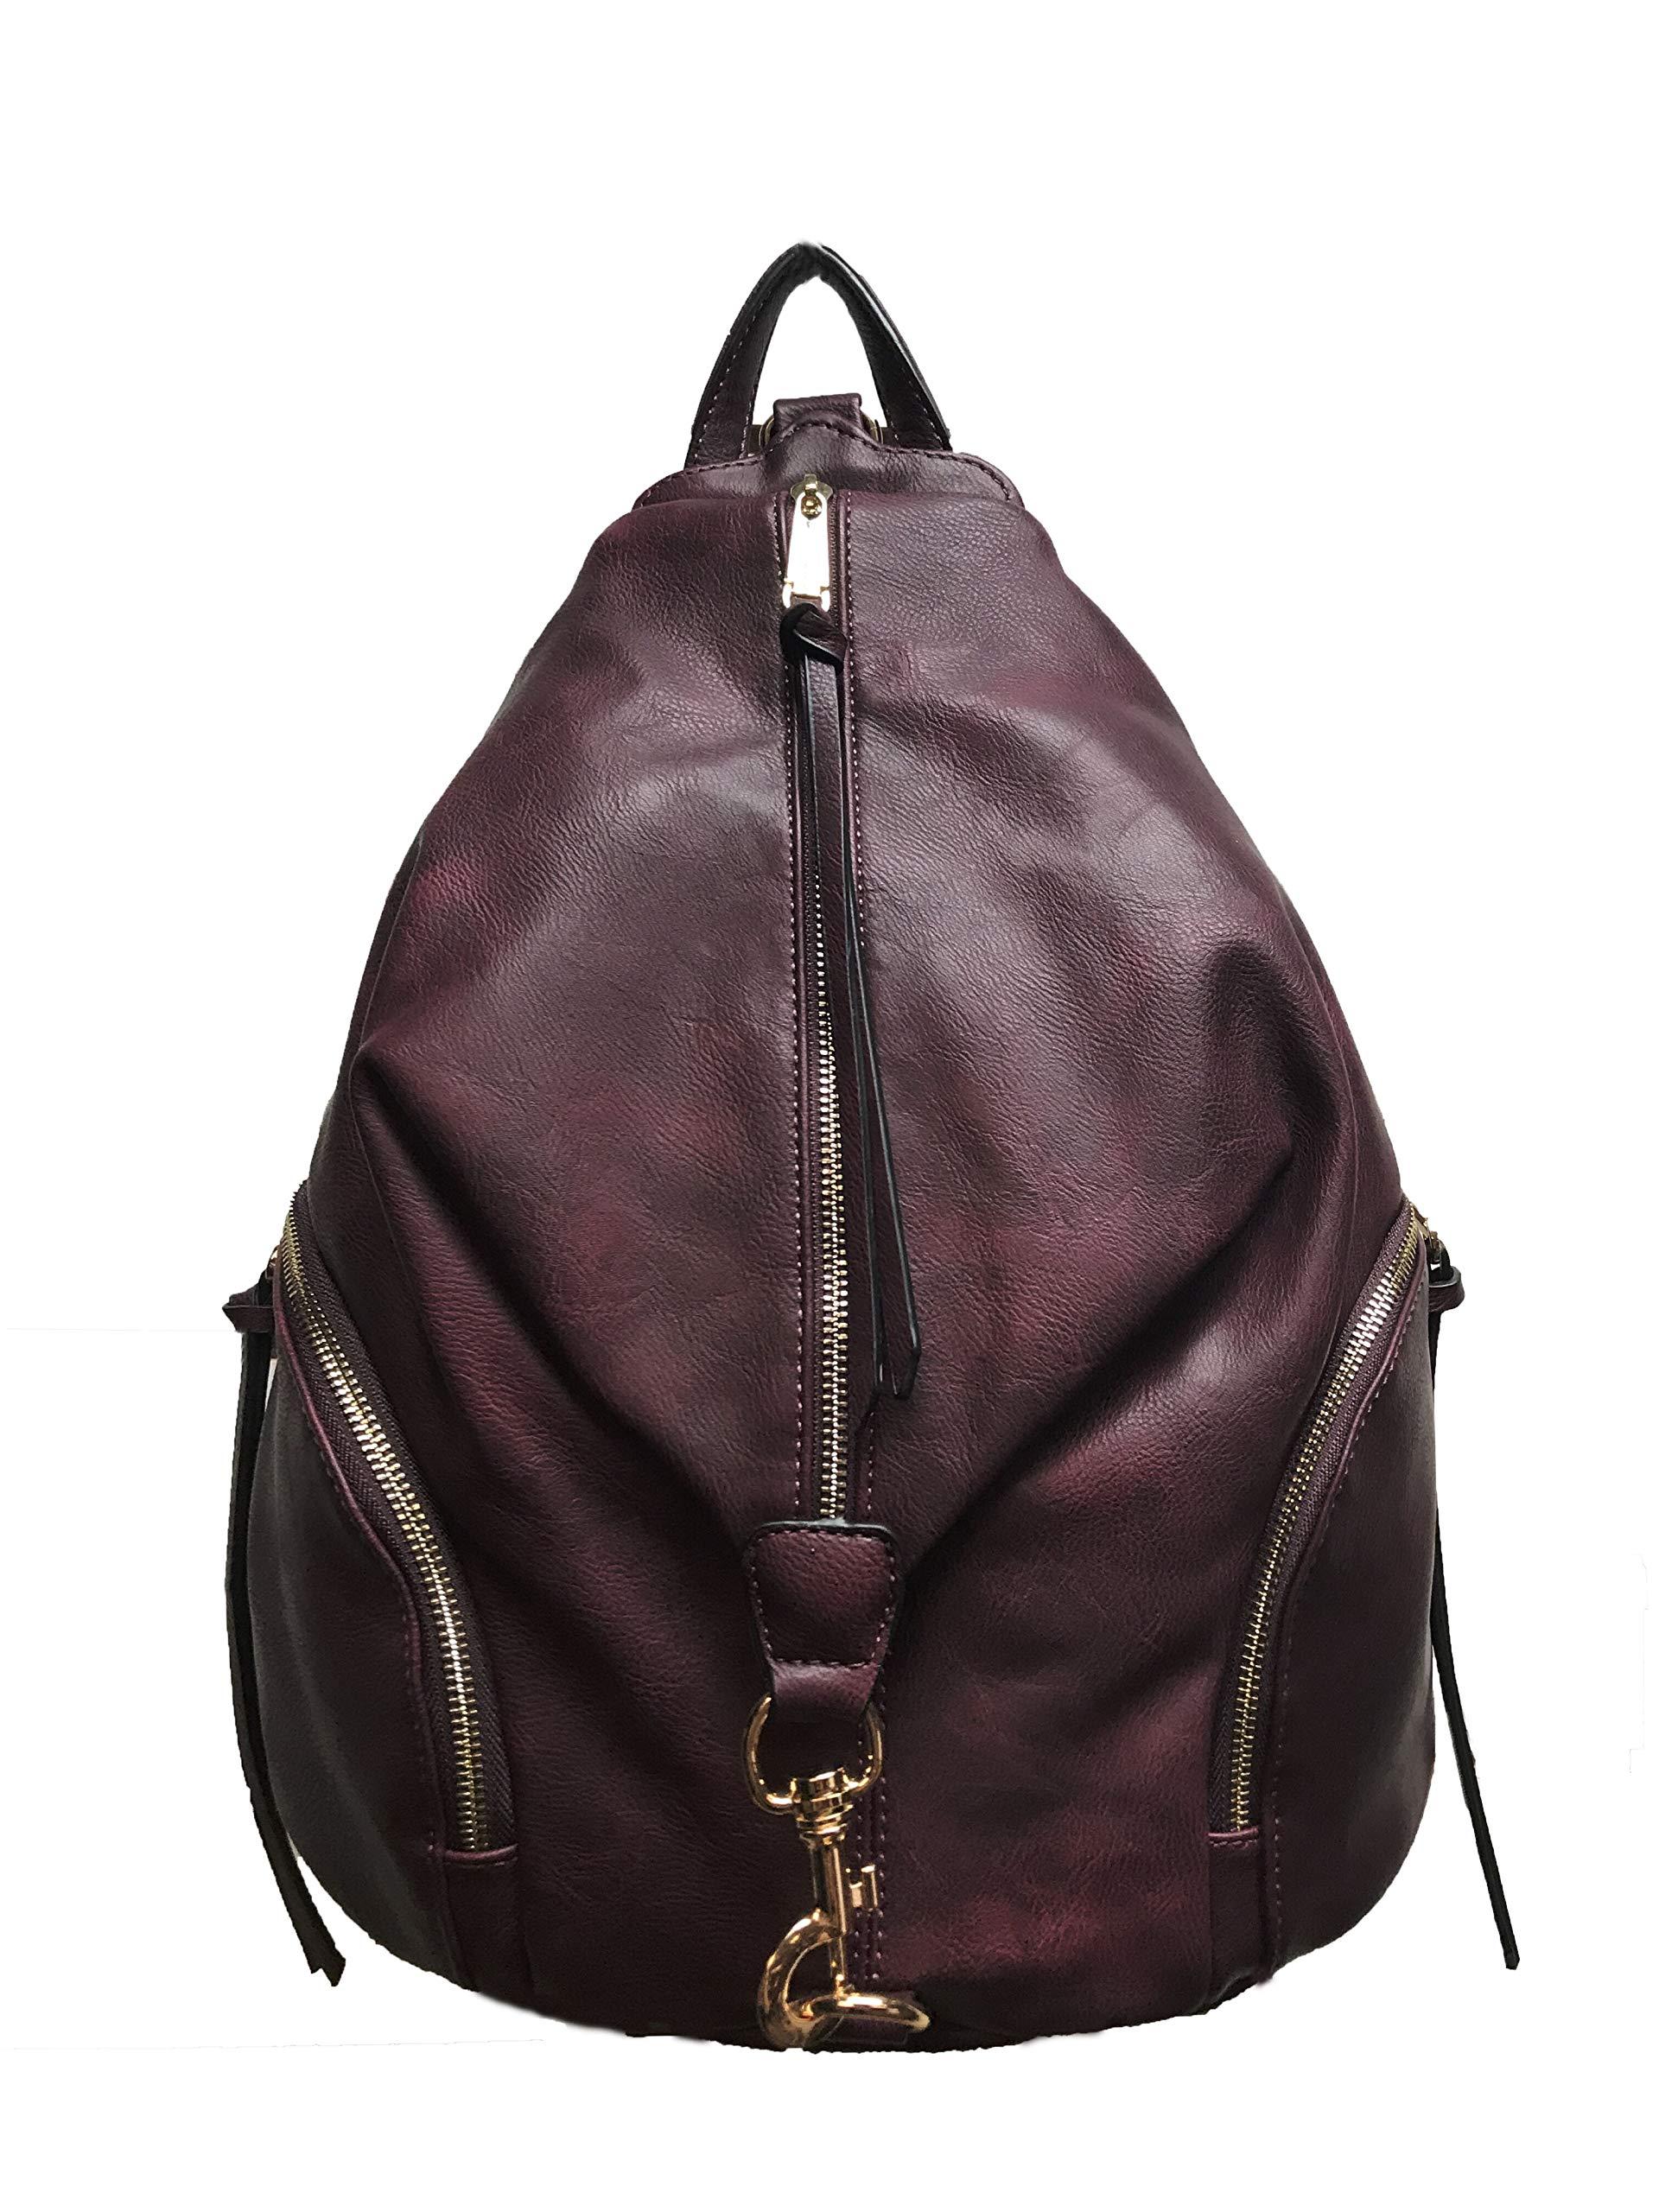 Diophy PU Leather Fashion Backpack with Zipper Pockets on Both Side Womens Purse Handbag AB-052